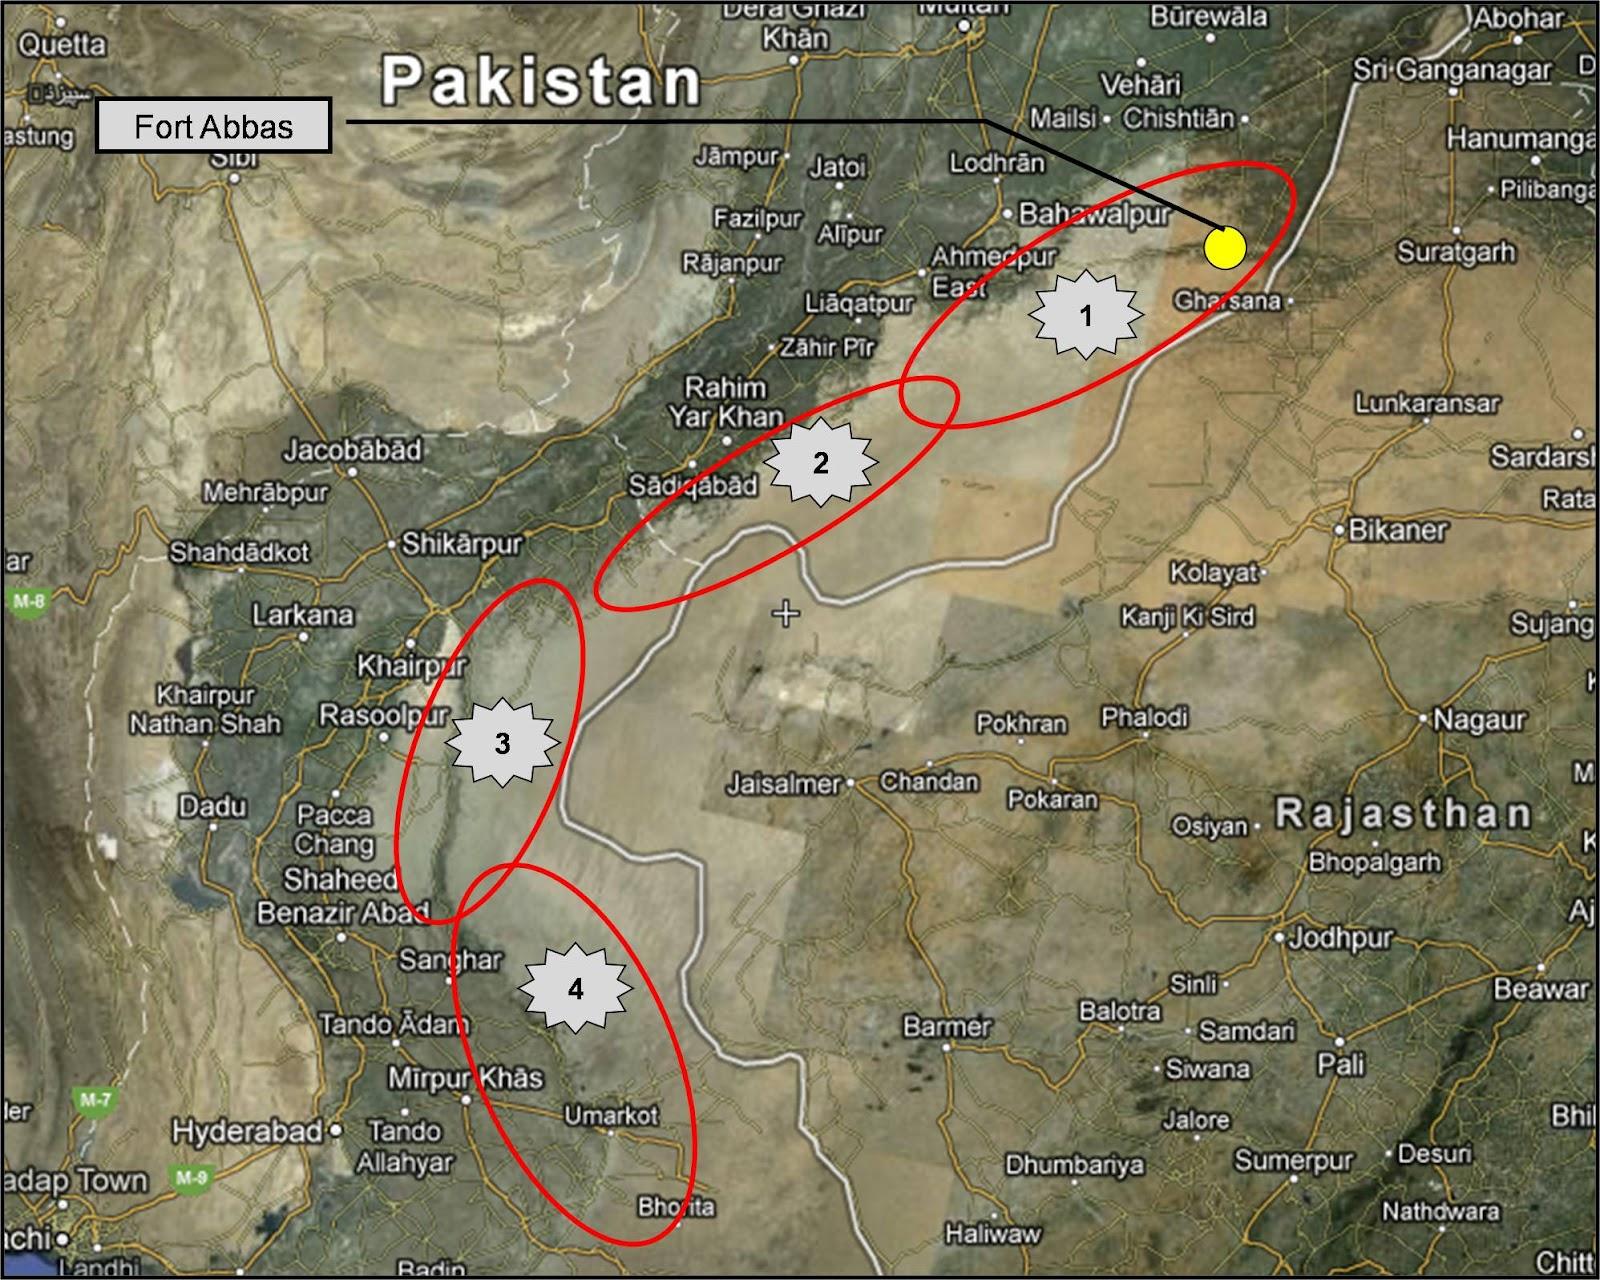 canal system of pakistan pdf